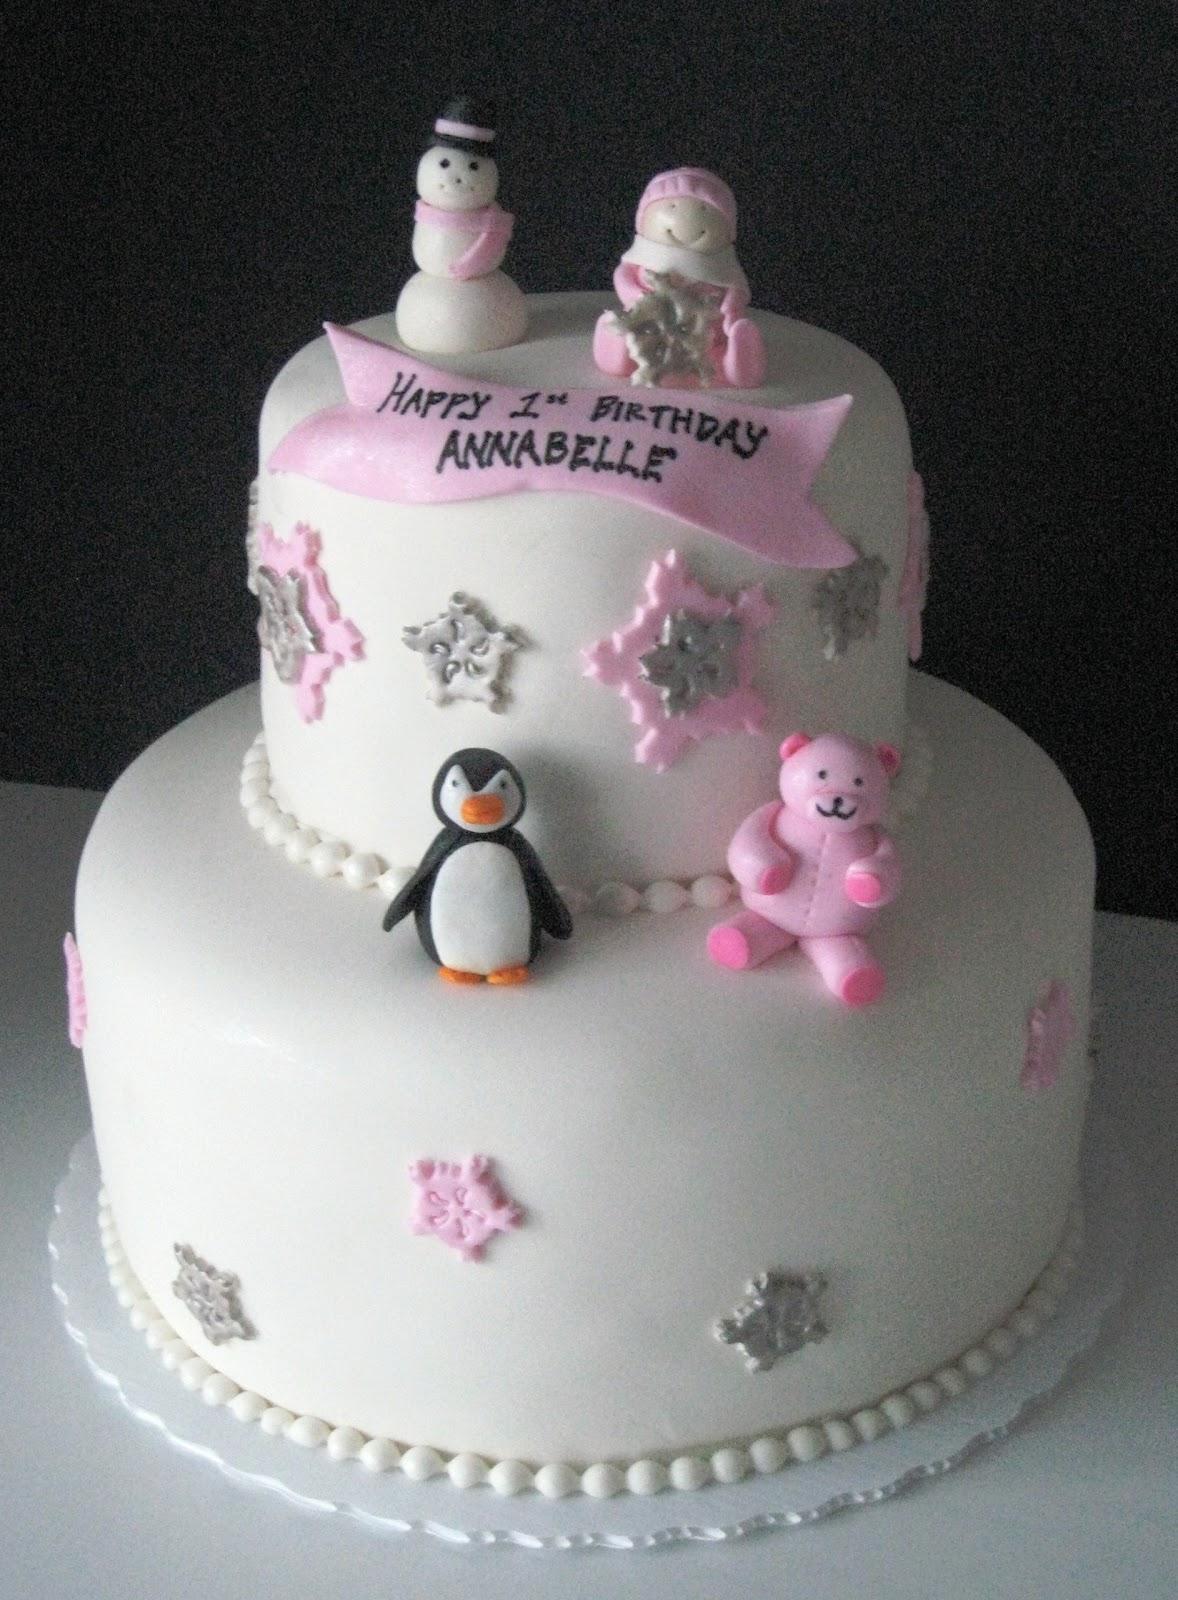 Heavenly Bites Cakes Winter Onederland 1st Birthday Cake